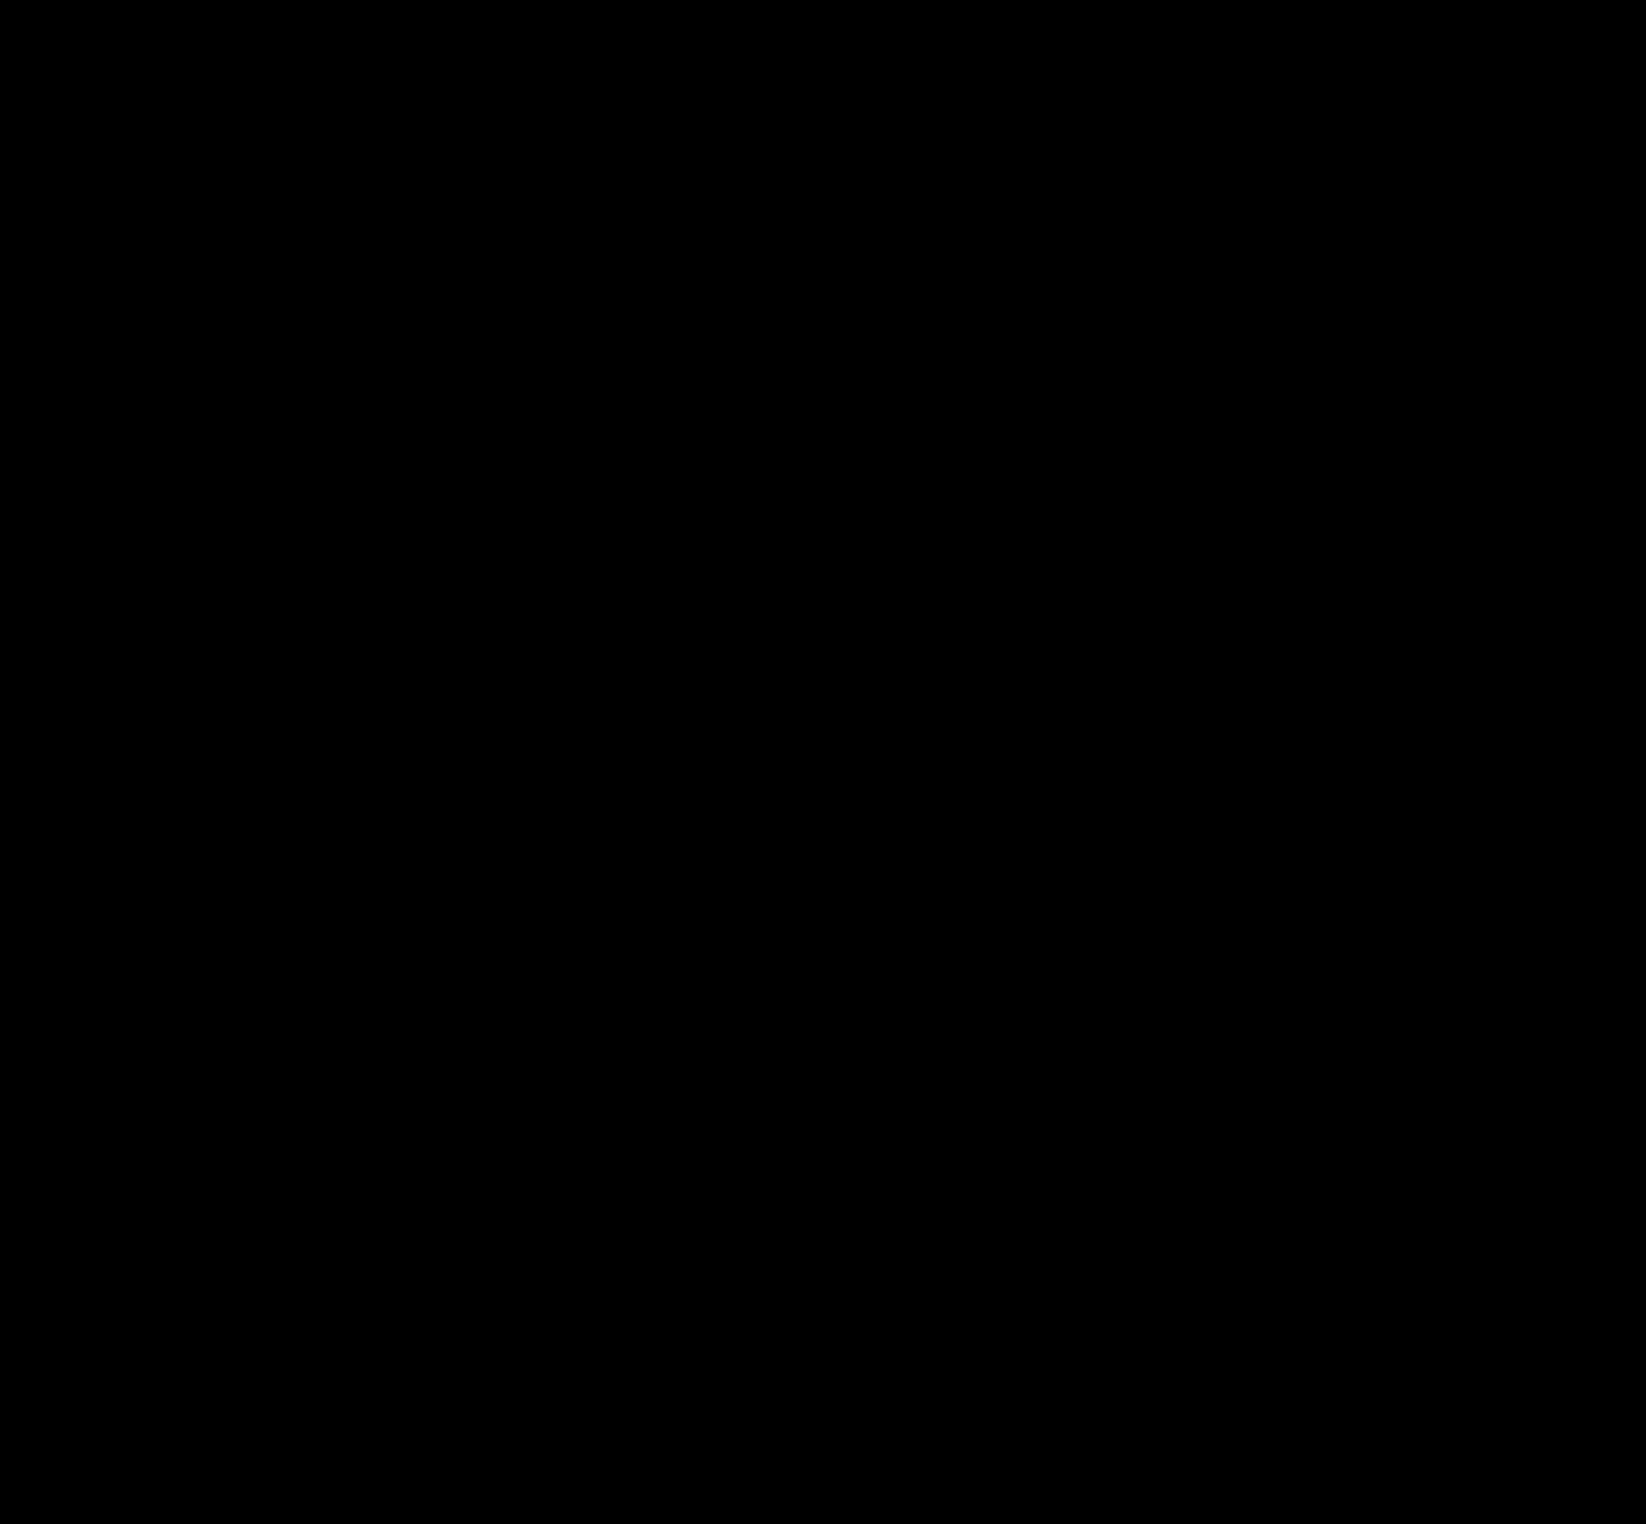 Clipart gallery eagle profile. Silhouette clip art at